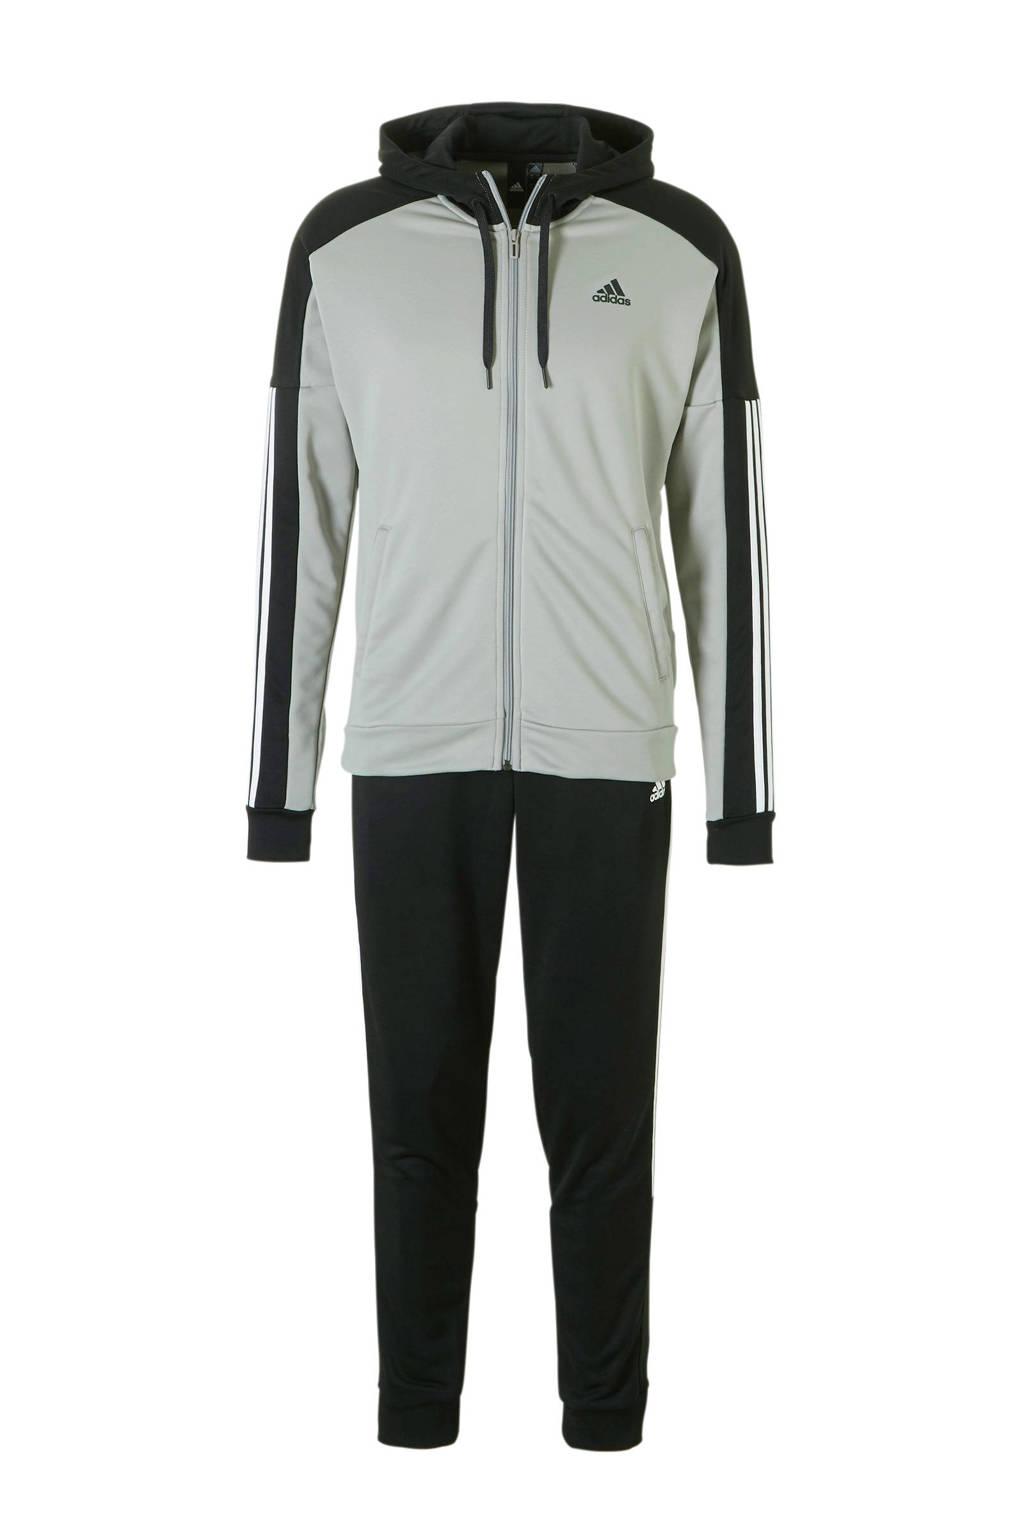 adidas performance   trainingspak zwart/grijs, Grijs/zwart/wit